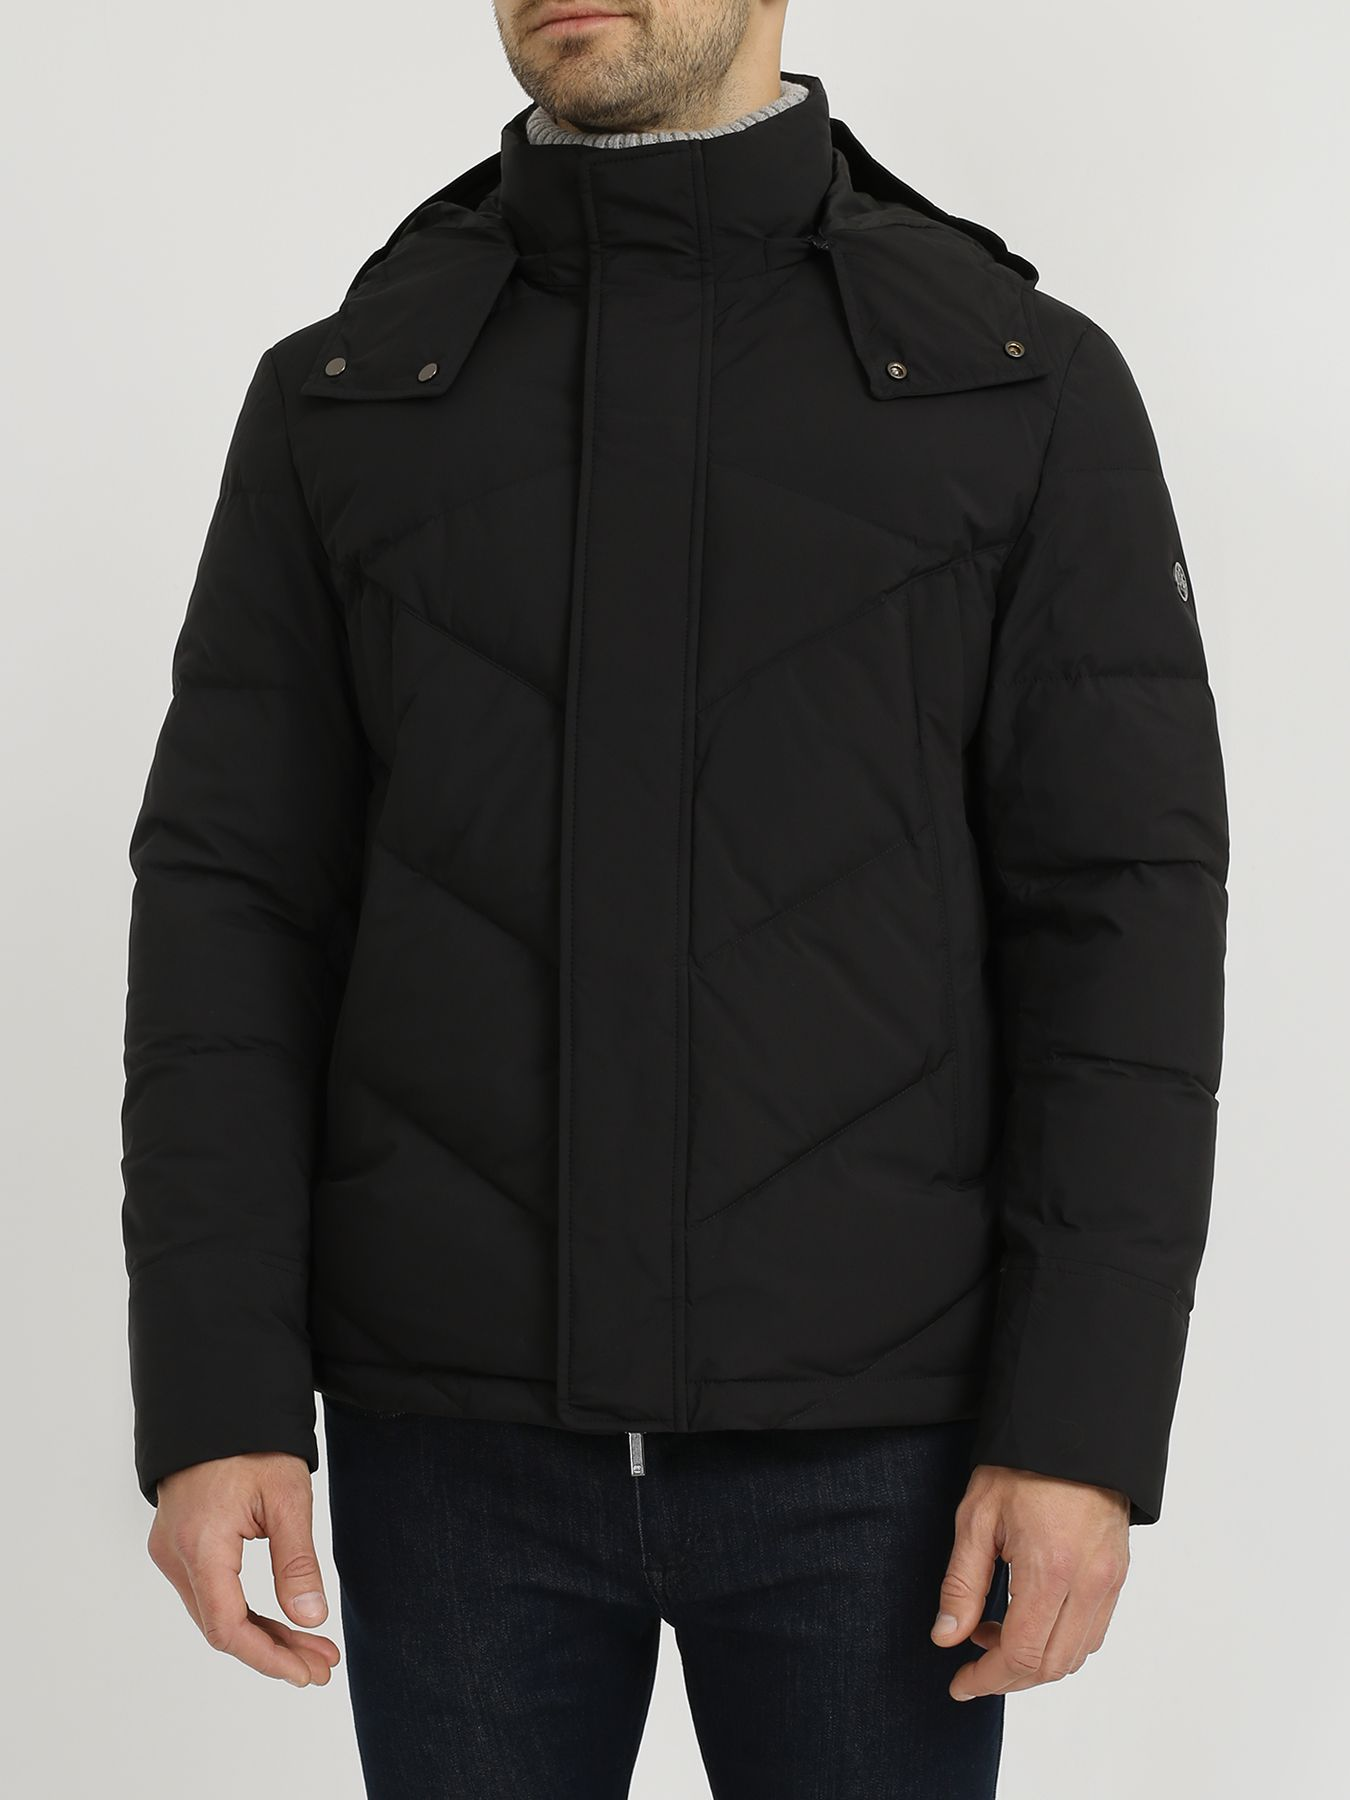 Пуховики Alessandro Manzoni Jeans Мужская куртка куртка мембранная мужская columbia bradley peak™ размер 46